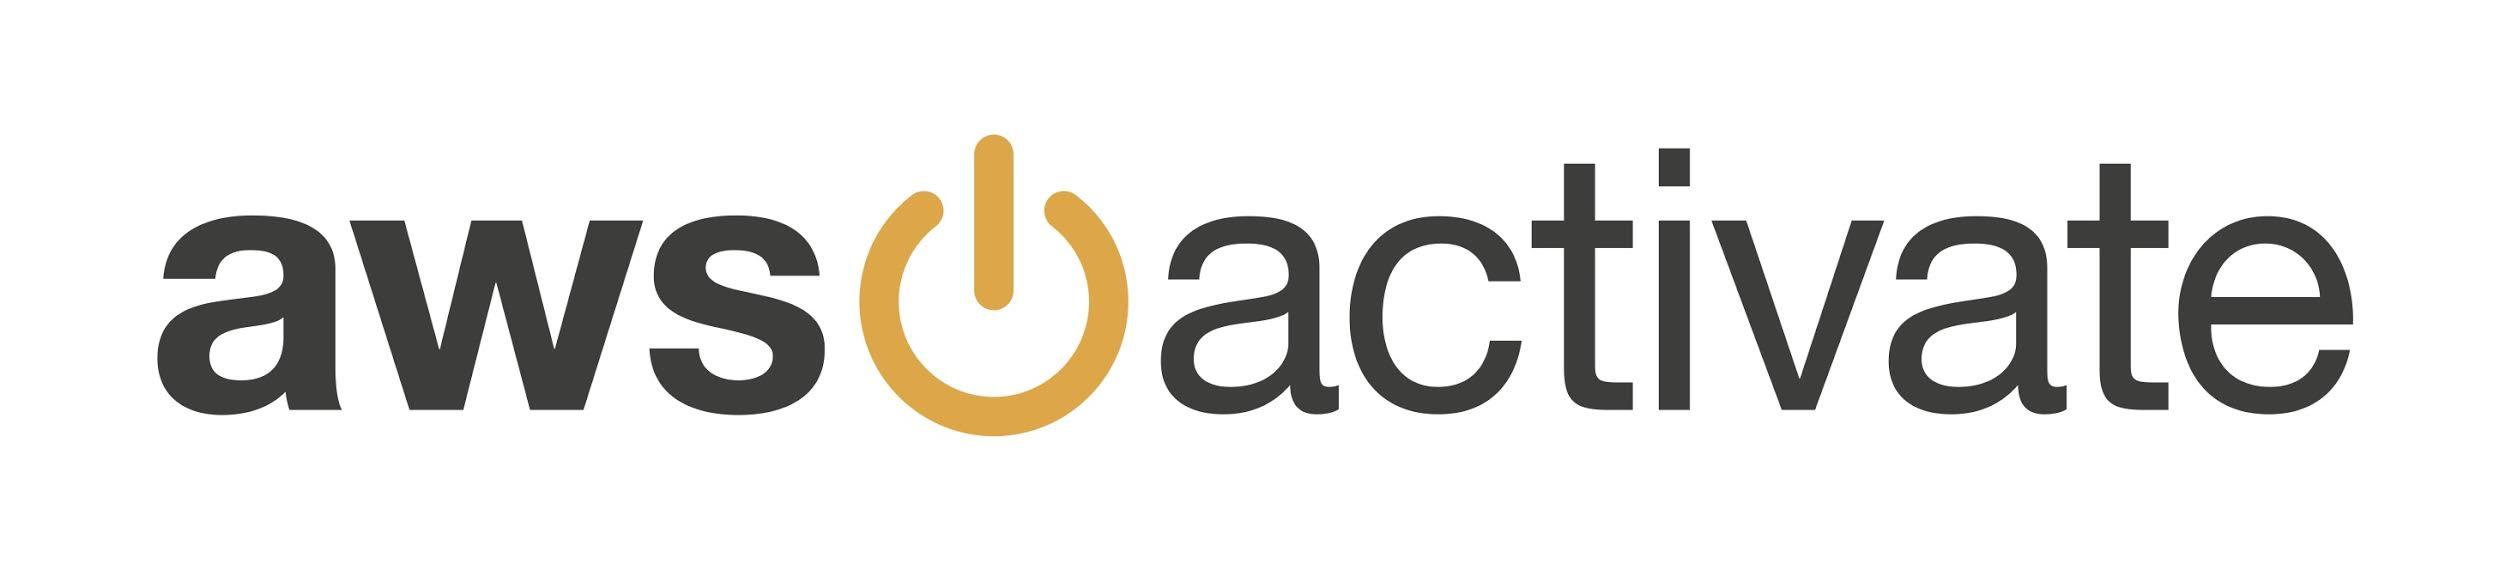 AWS Activate